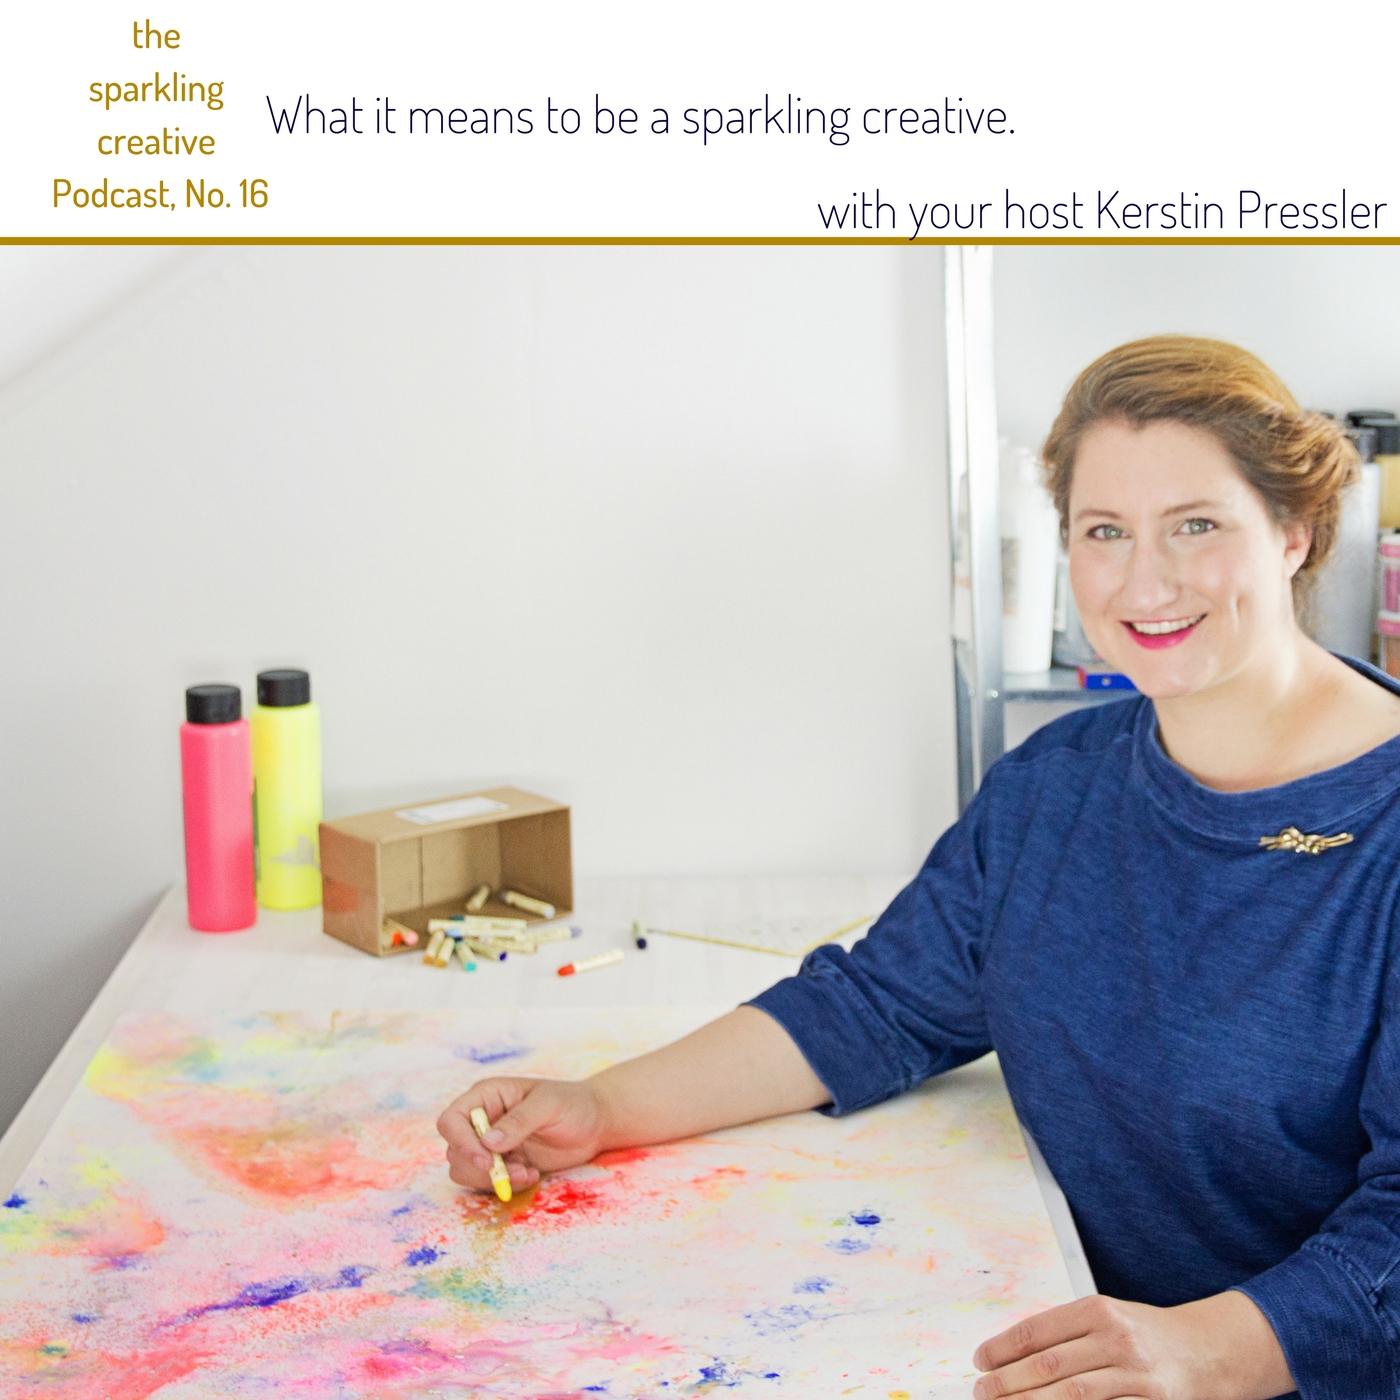 the sparkling creative Podcast, Episode 16: What it means to be a sparkling creative. www.kerstinpressler.com/blog-2/episode16